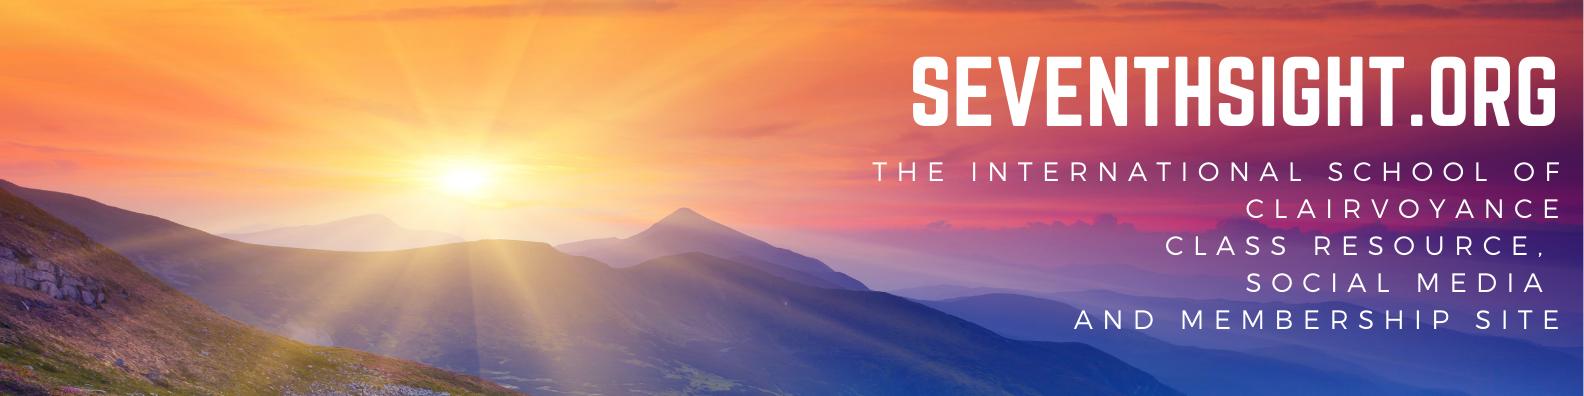 SeventhsightNew Logo